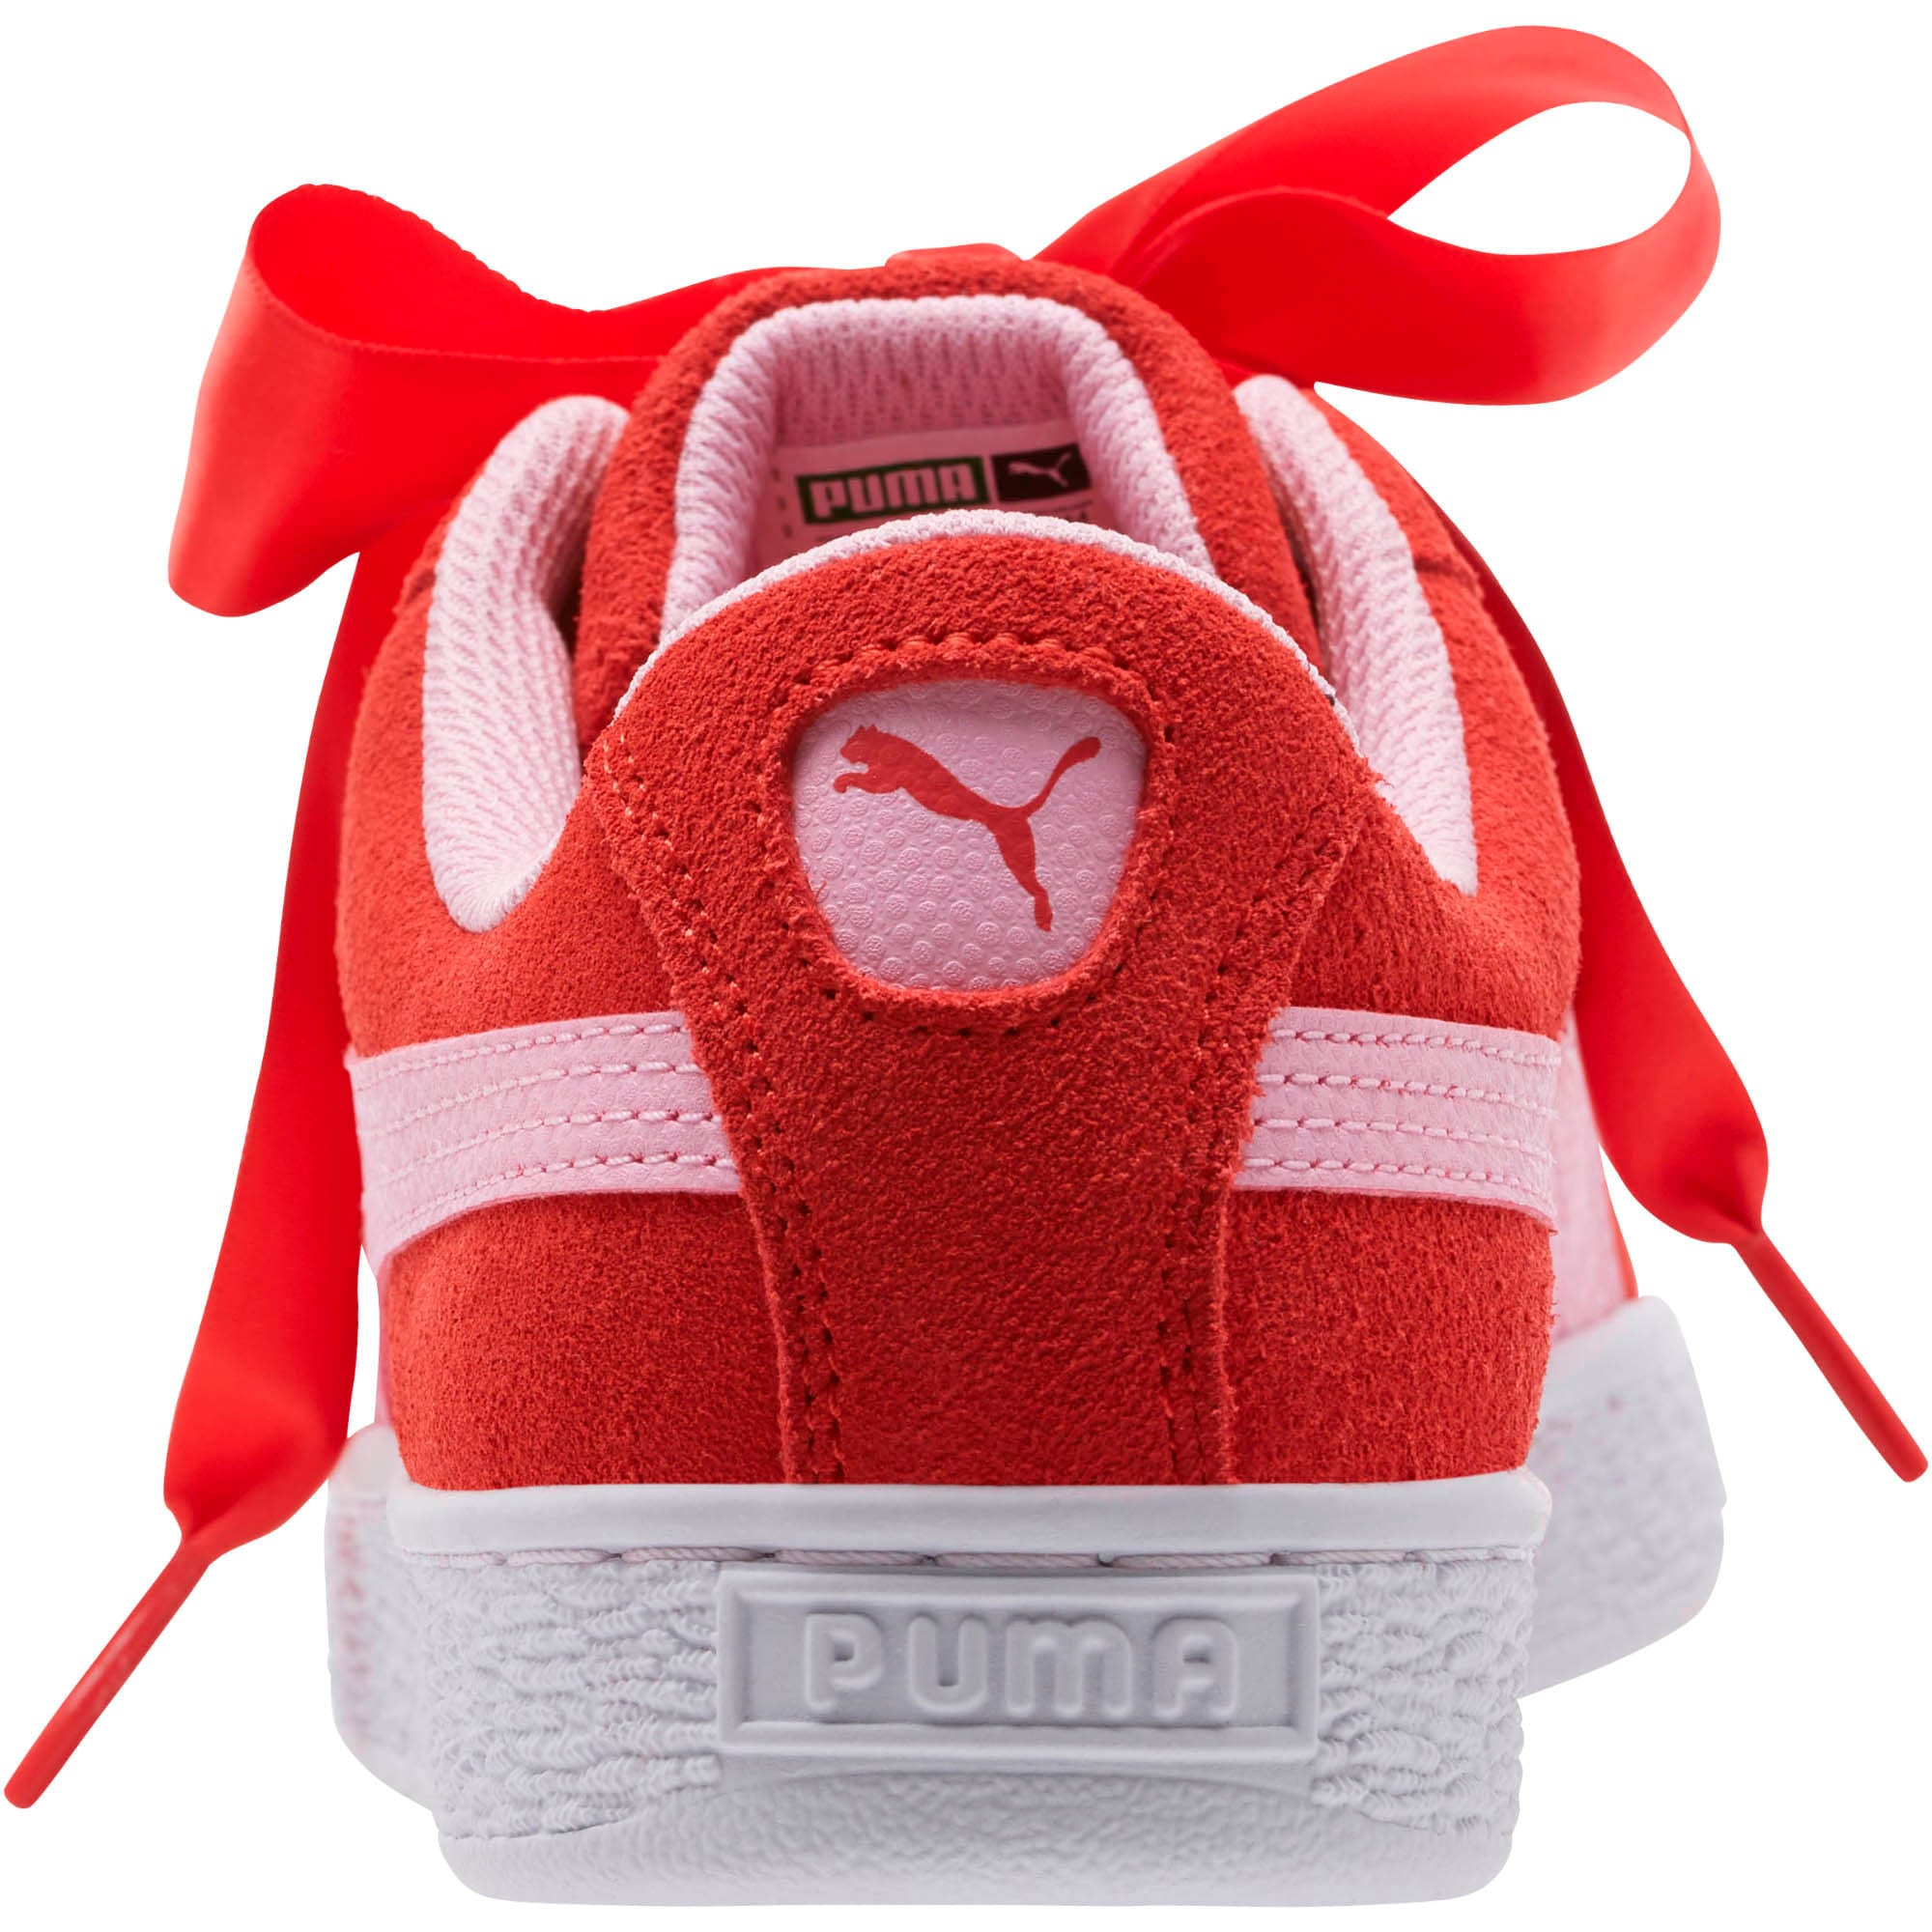 Thumbnail 4 of Suede Heart Radicals Sneakers JR, Hibiscus -Pale Pink, medium